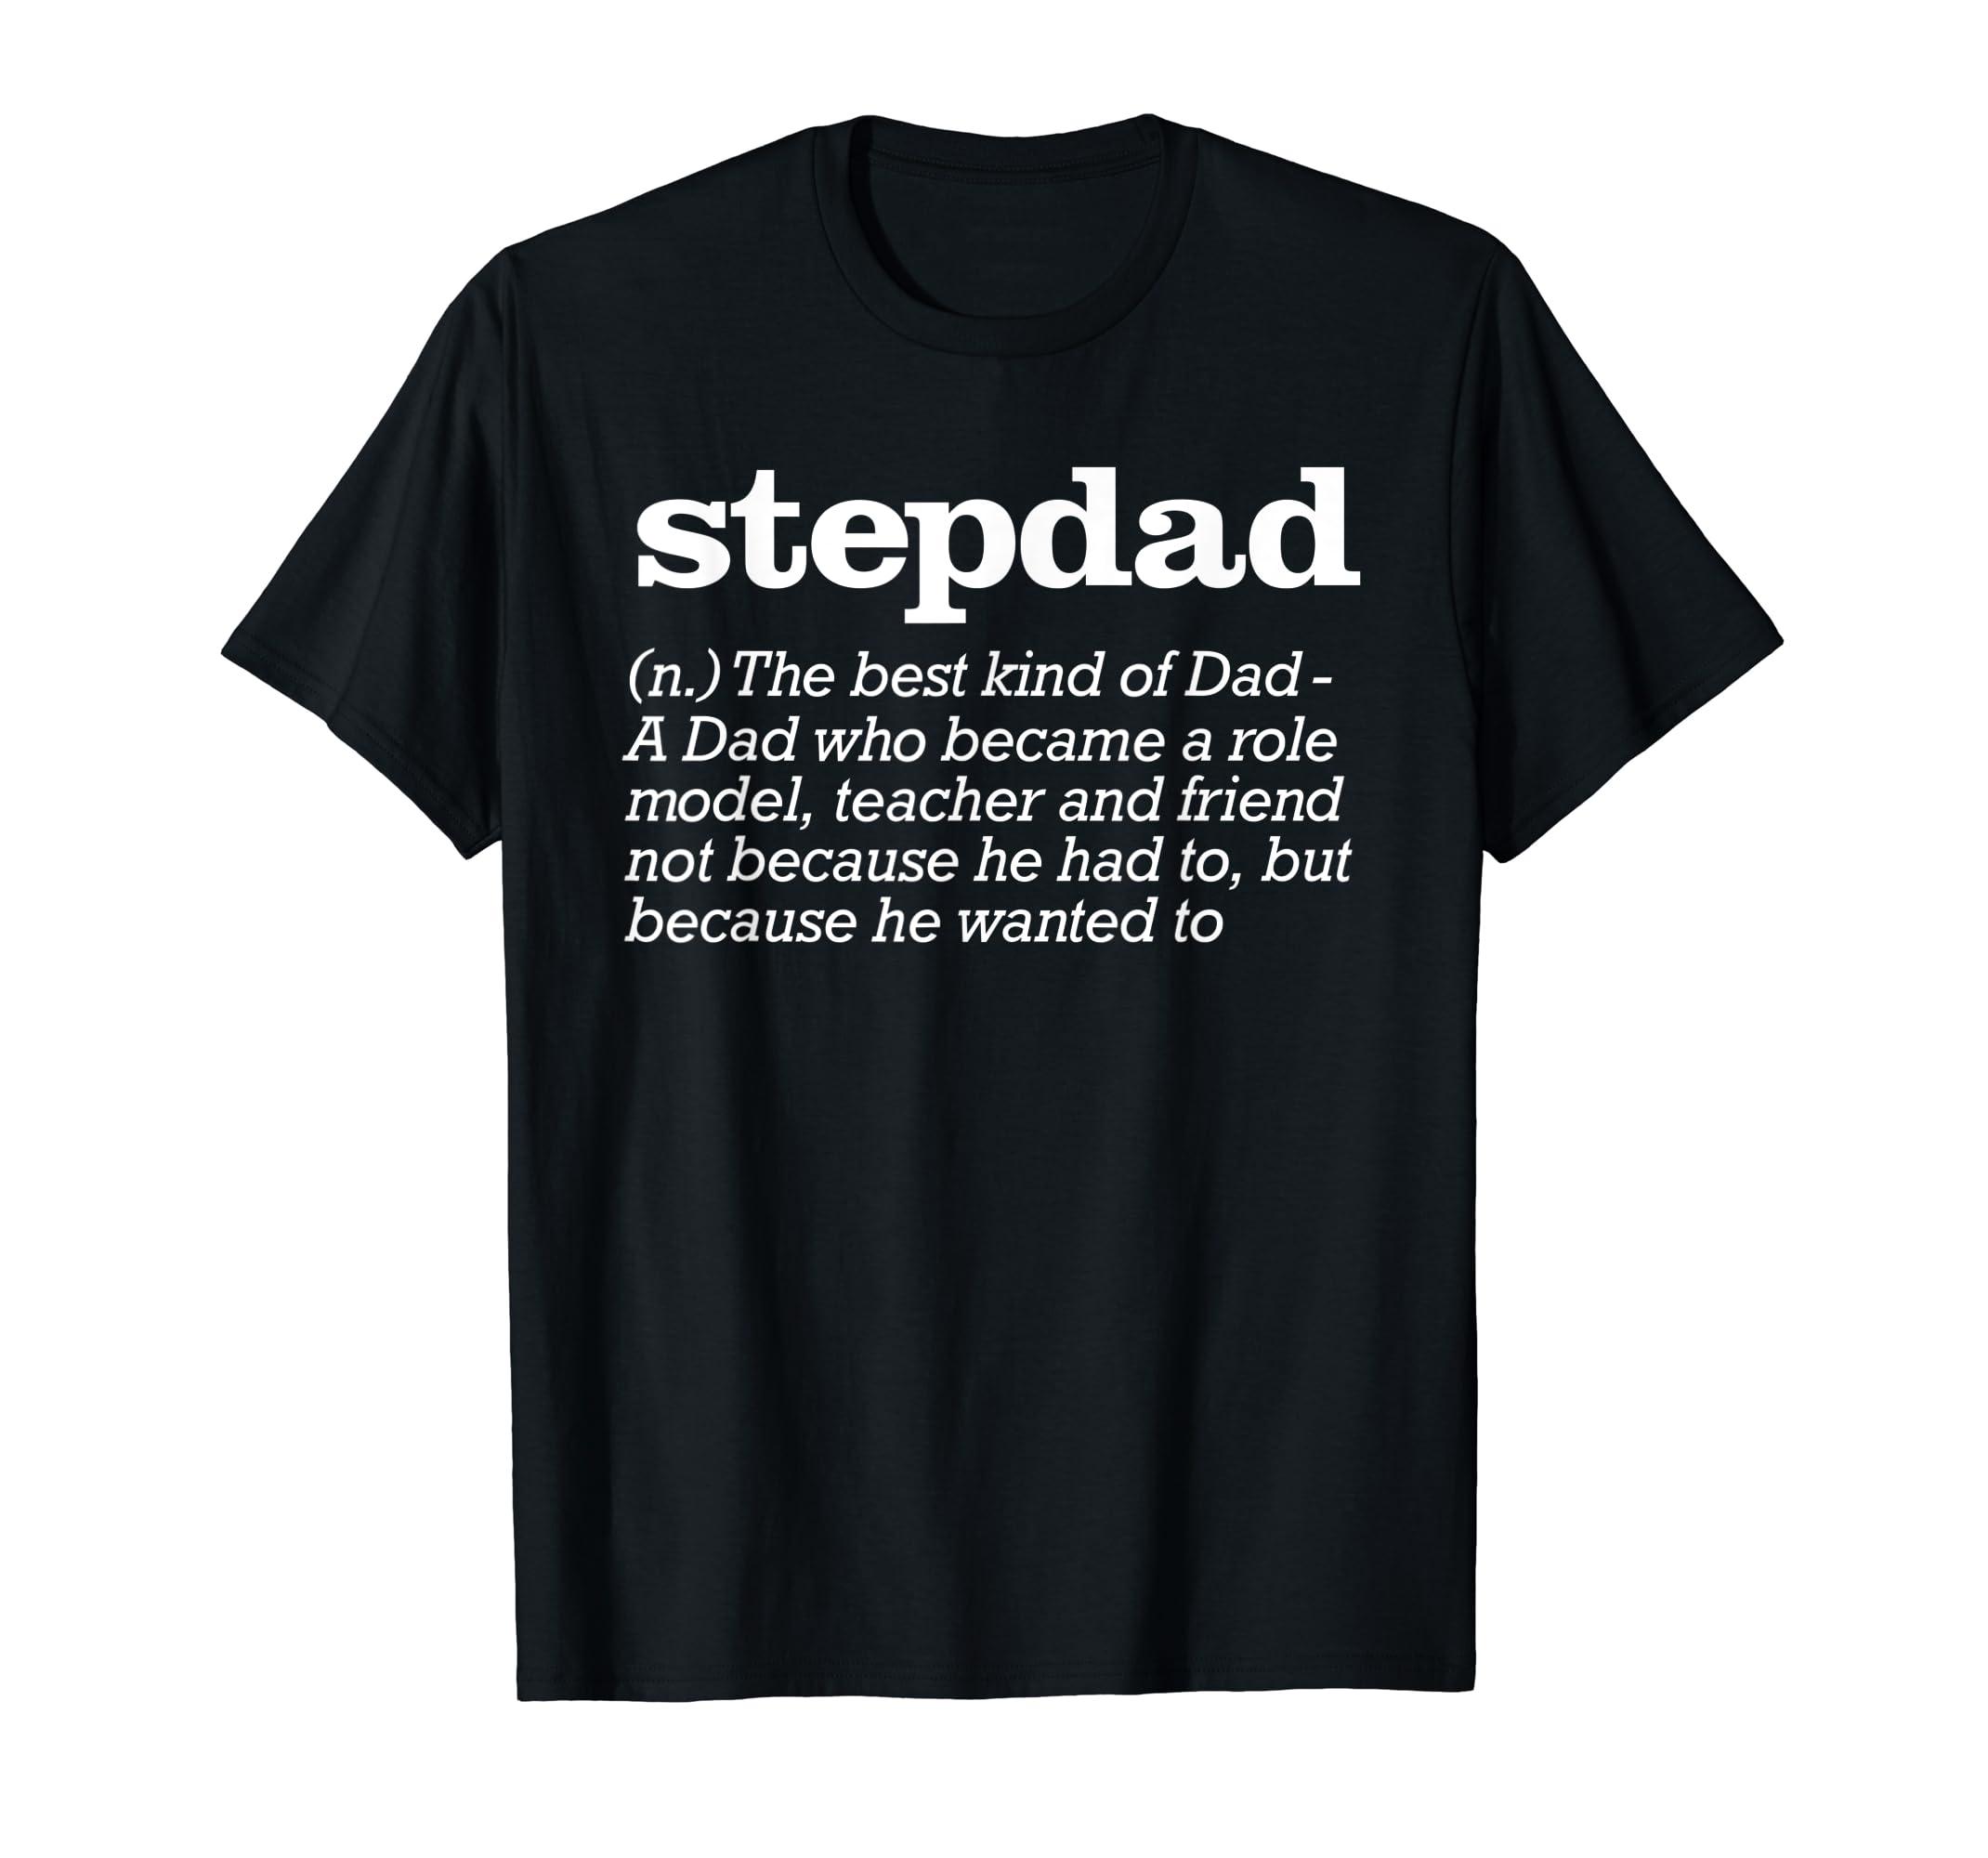 Mens Stepdad Definition Shirt - Stepfather Gift from Kids-Men's T-Shirt-Black